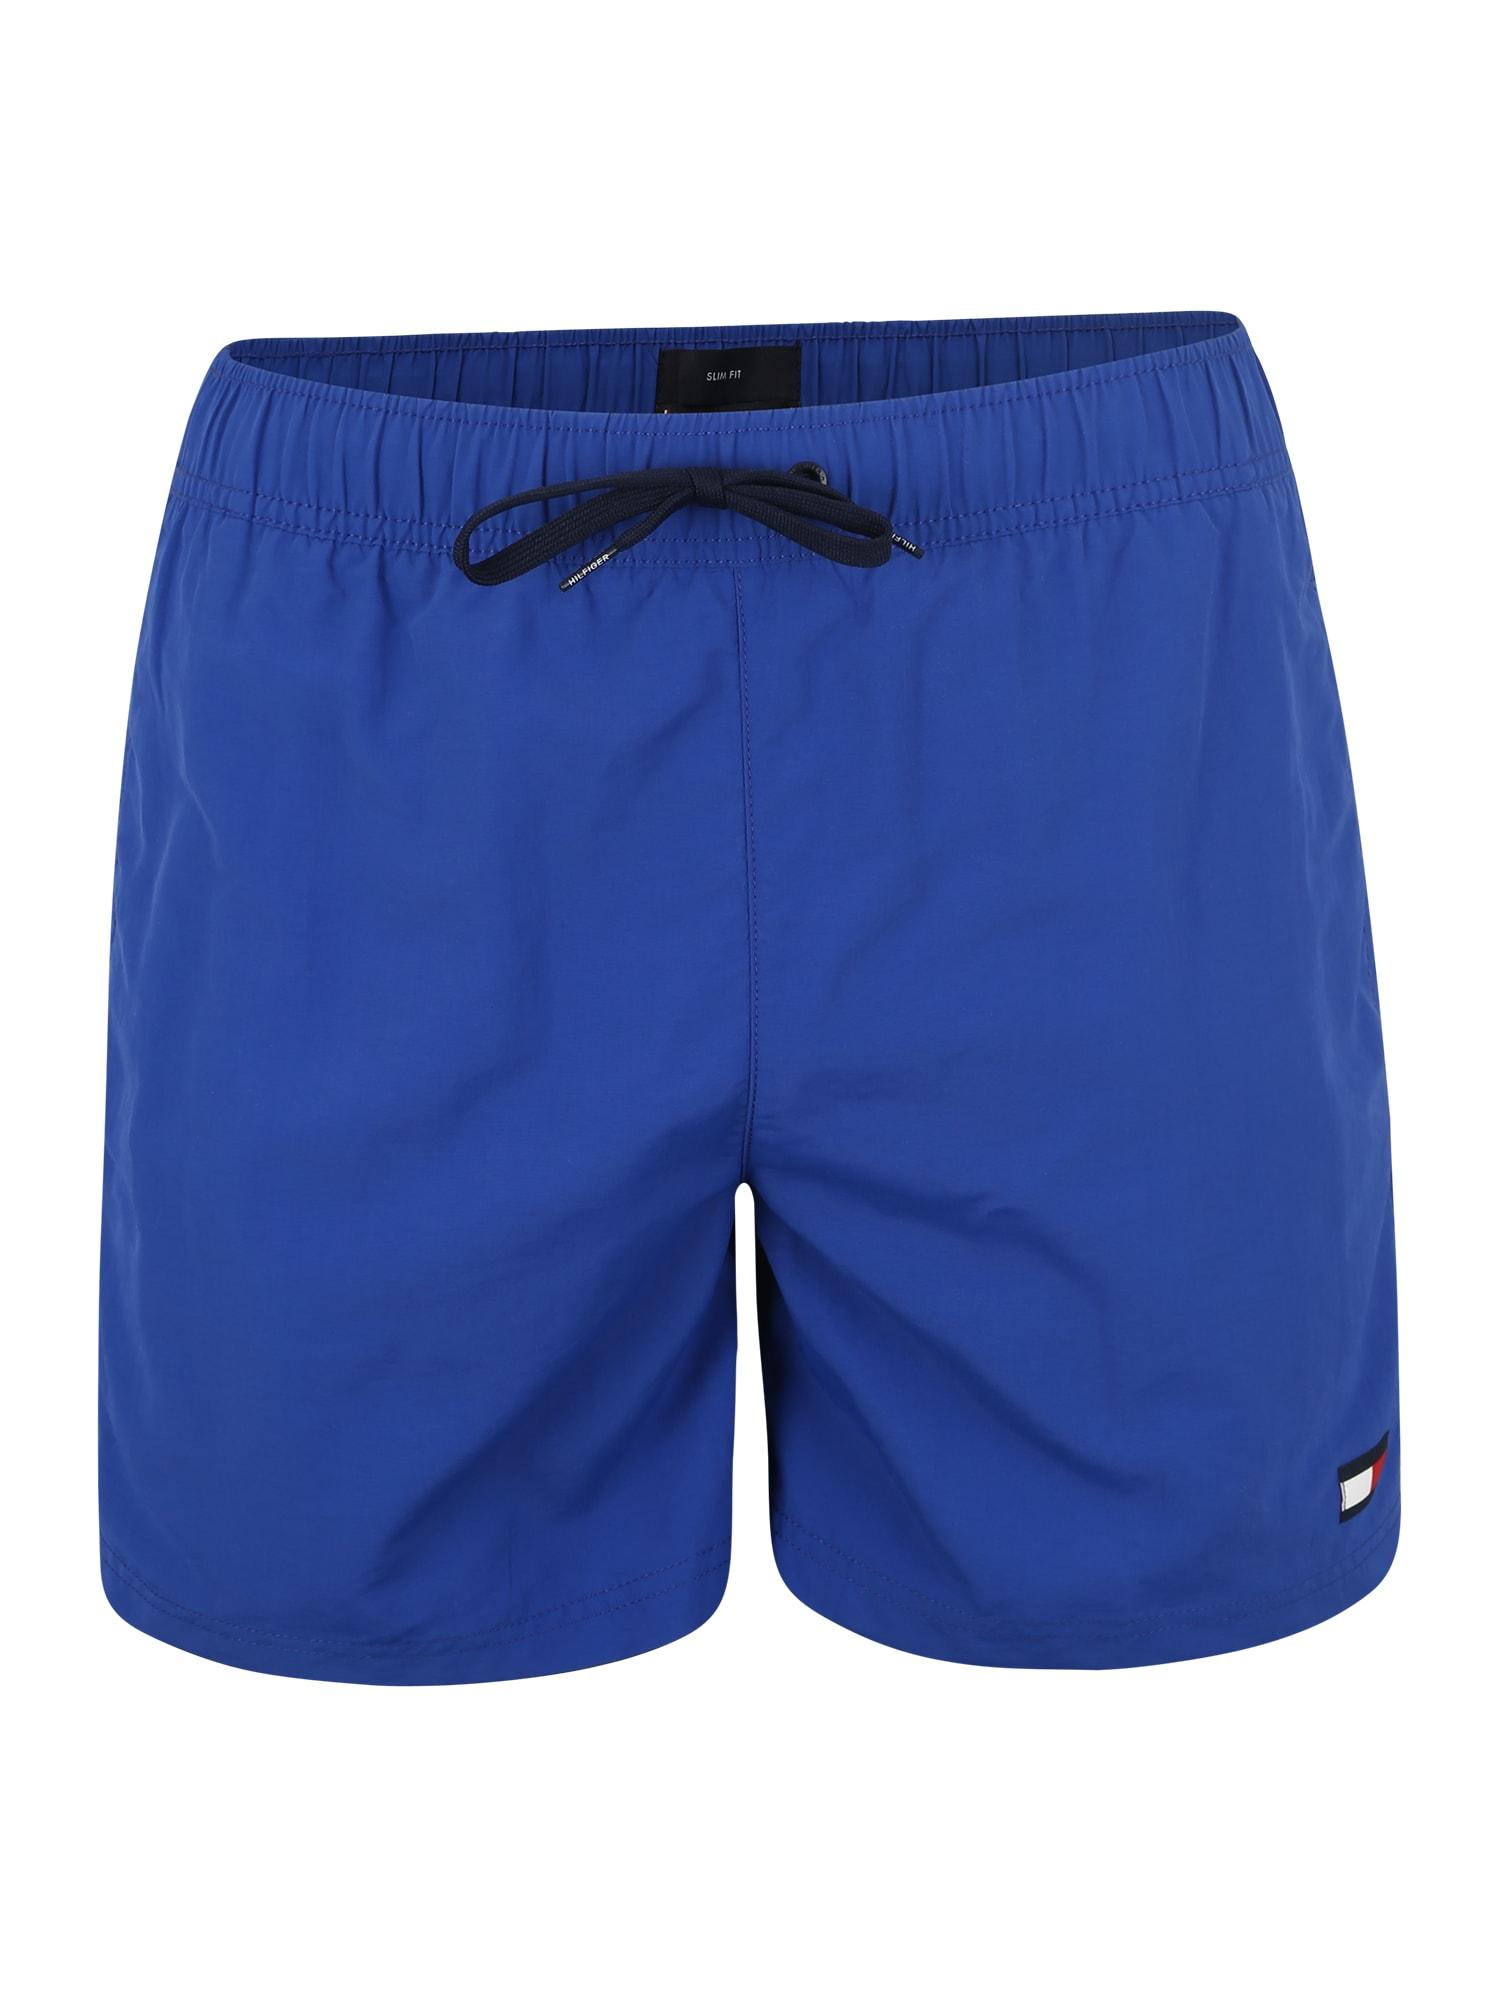 Plavecké šortky SF MEDIUM DRAWSTRING modrá Tommy Hilfiger Underwear